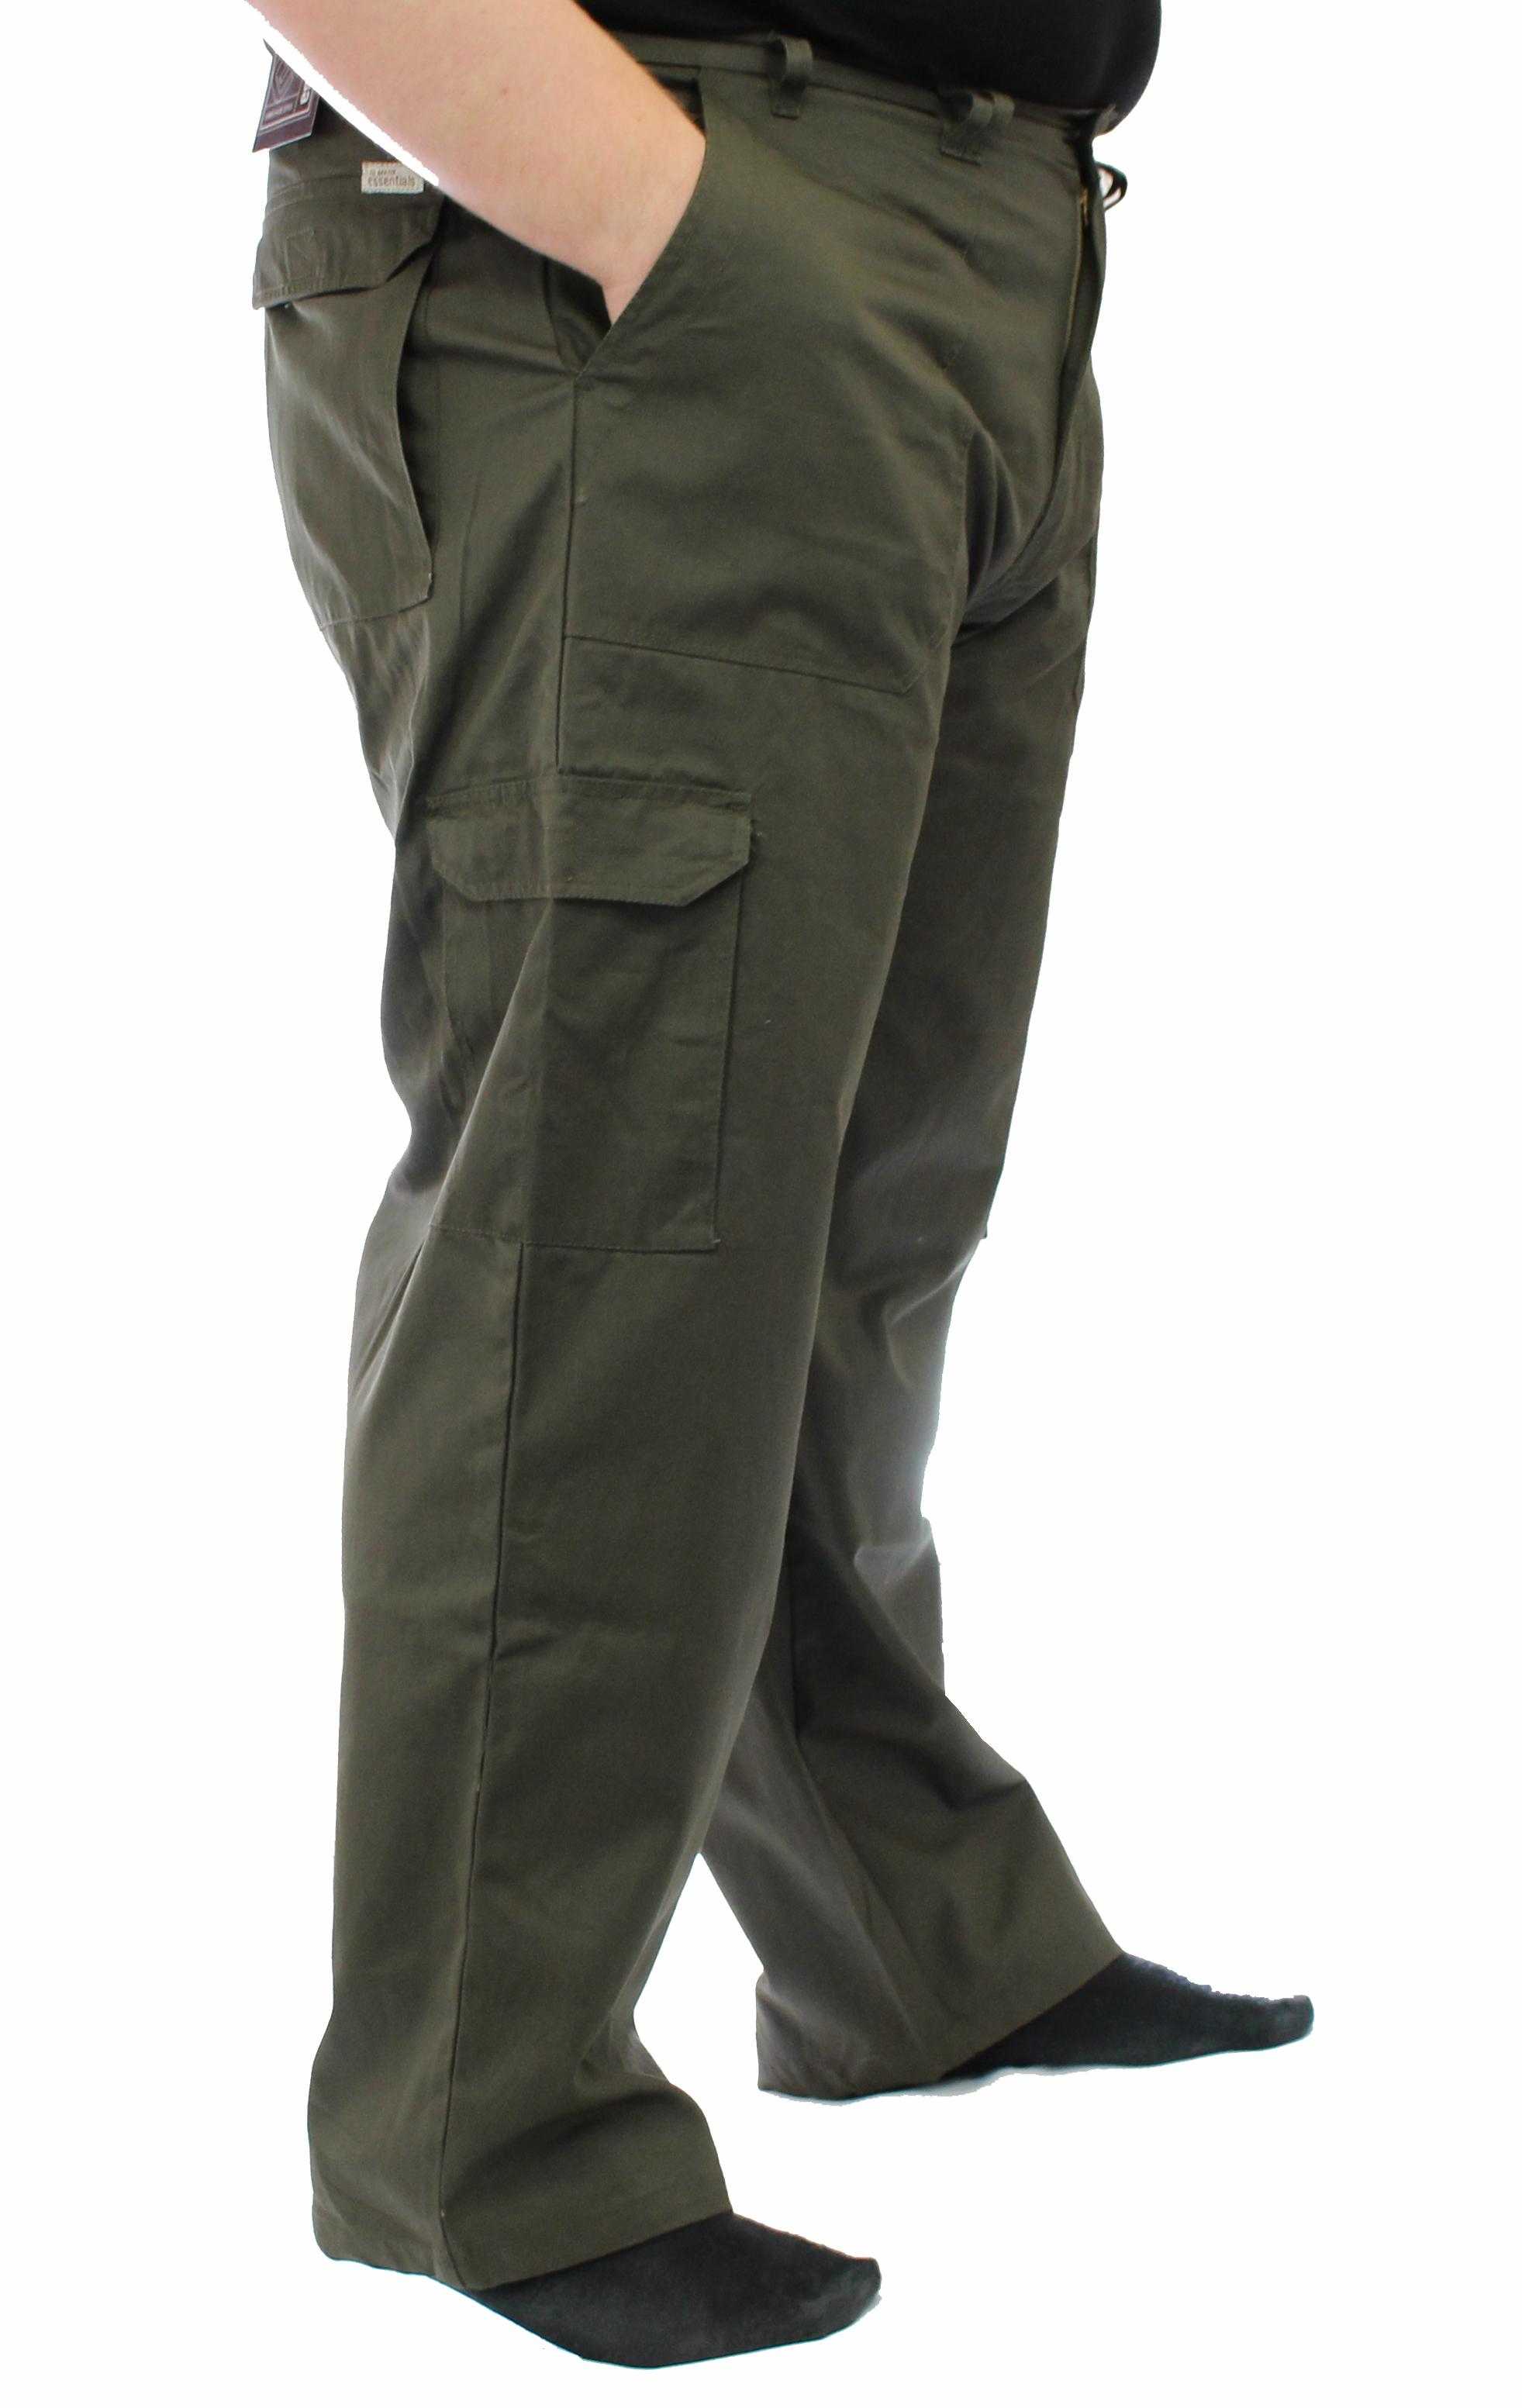 "Ed Baxter Victory - Heavy Duty Cargo Combat Trousers- Khaki - 42"" Waist, 32"" Leg"